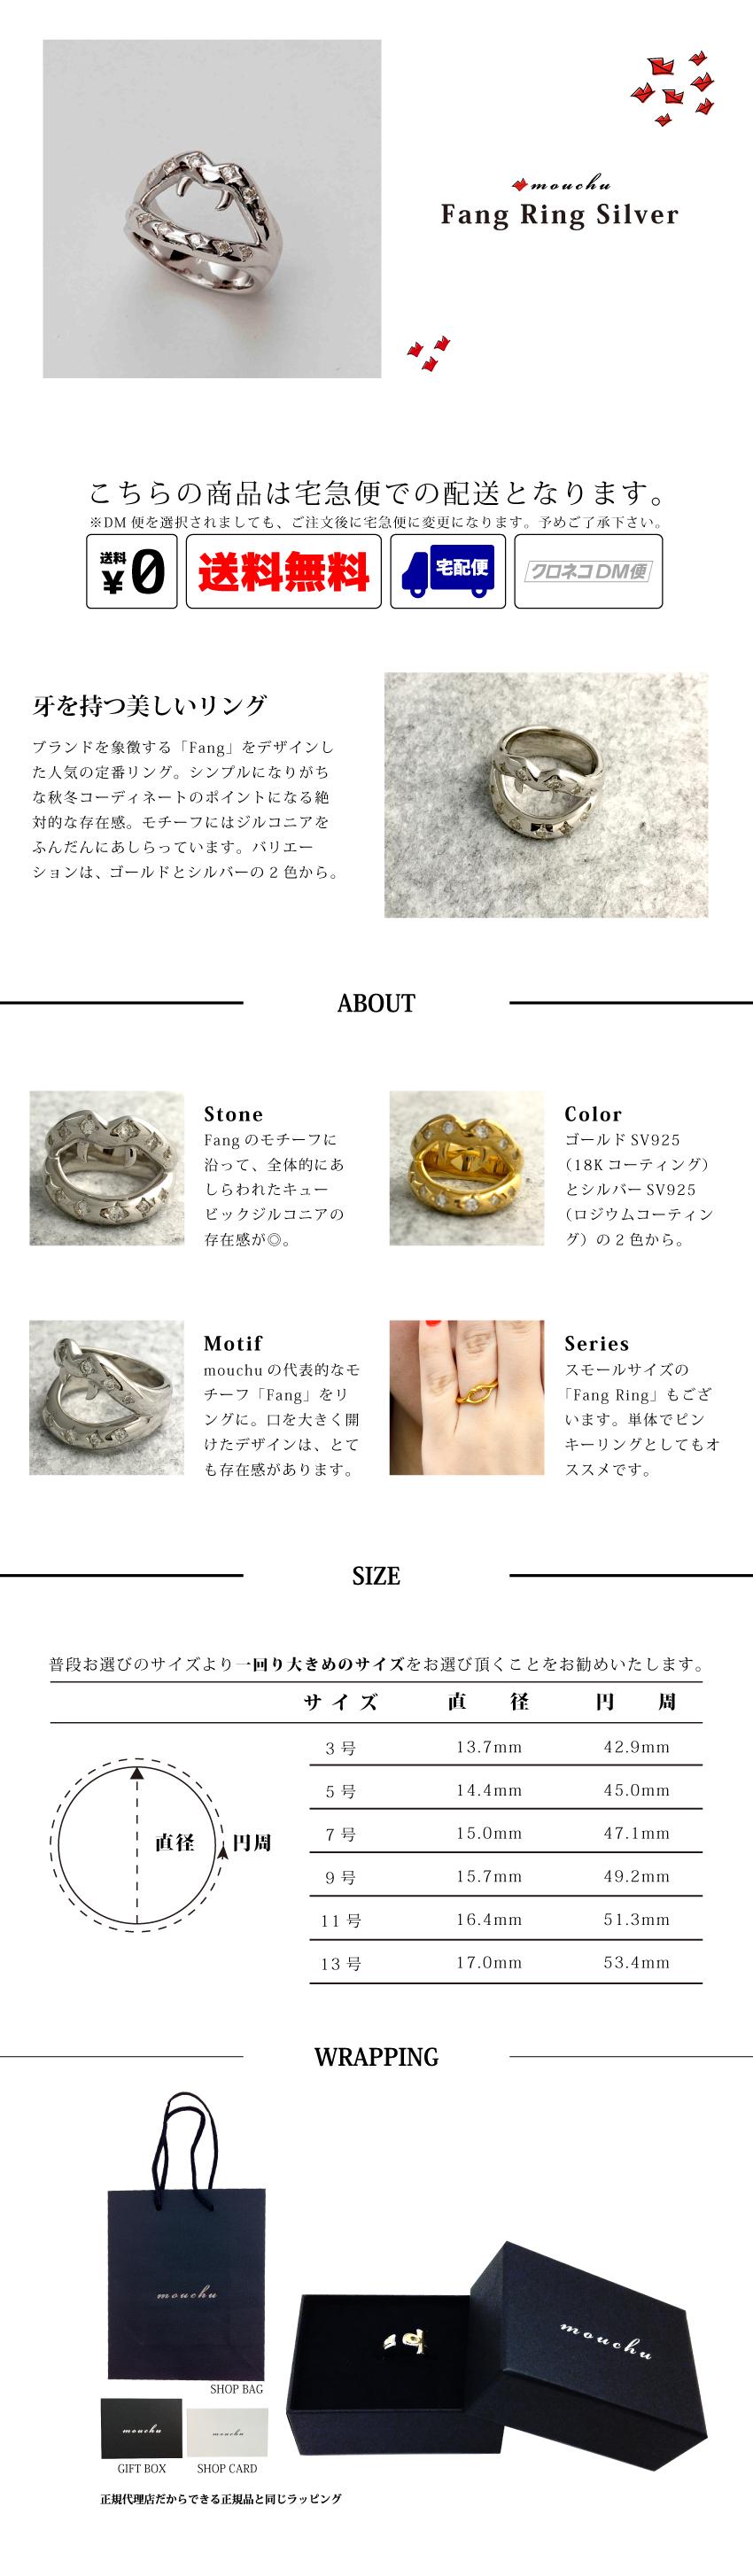 fang-ring_silver.jpg